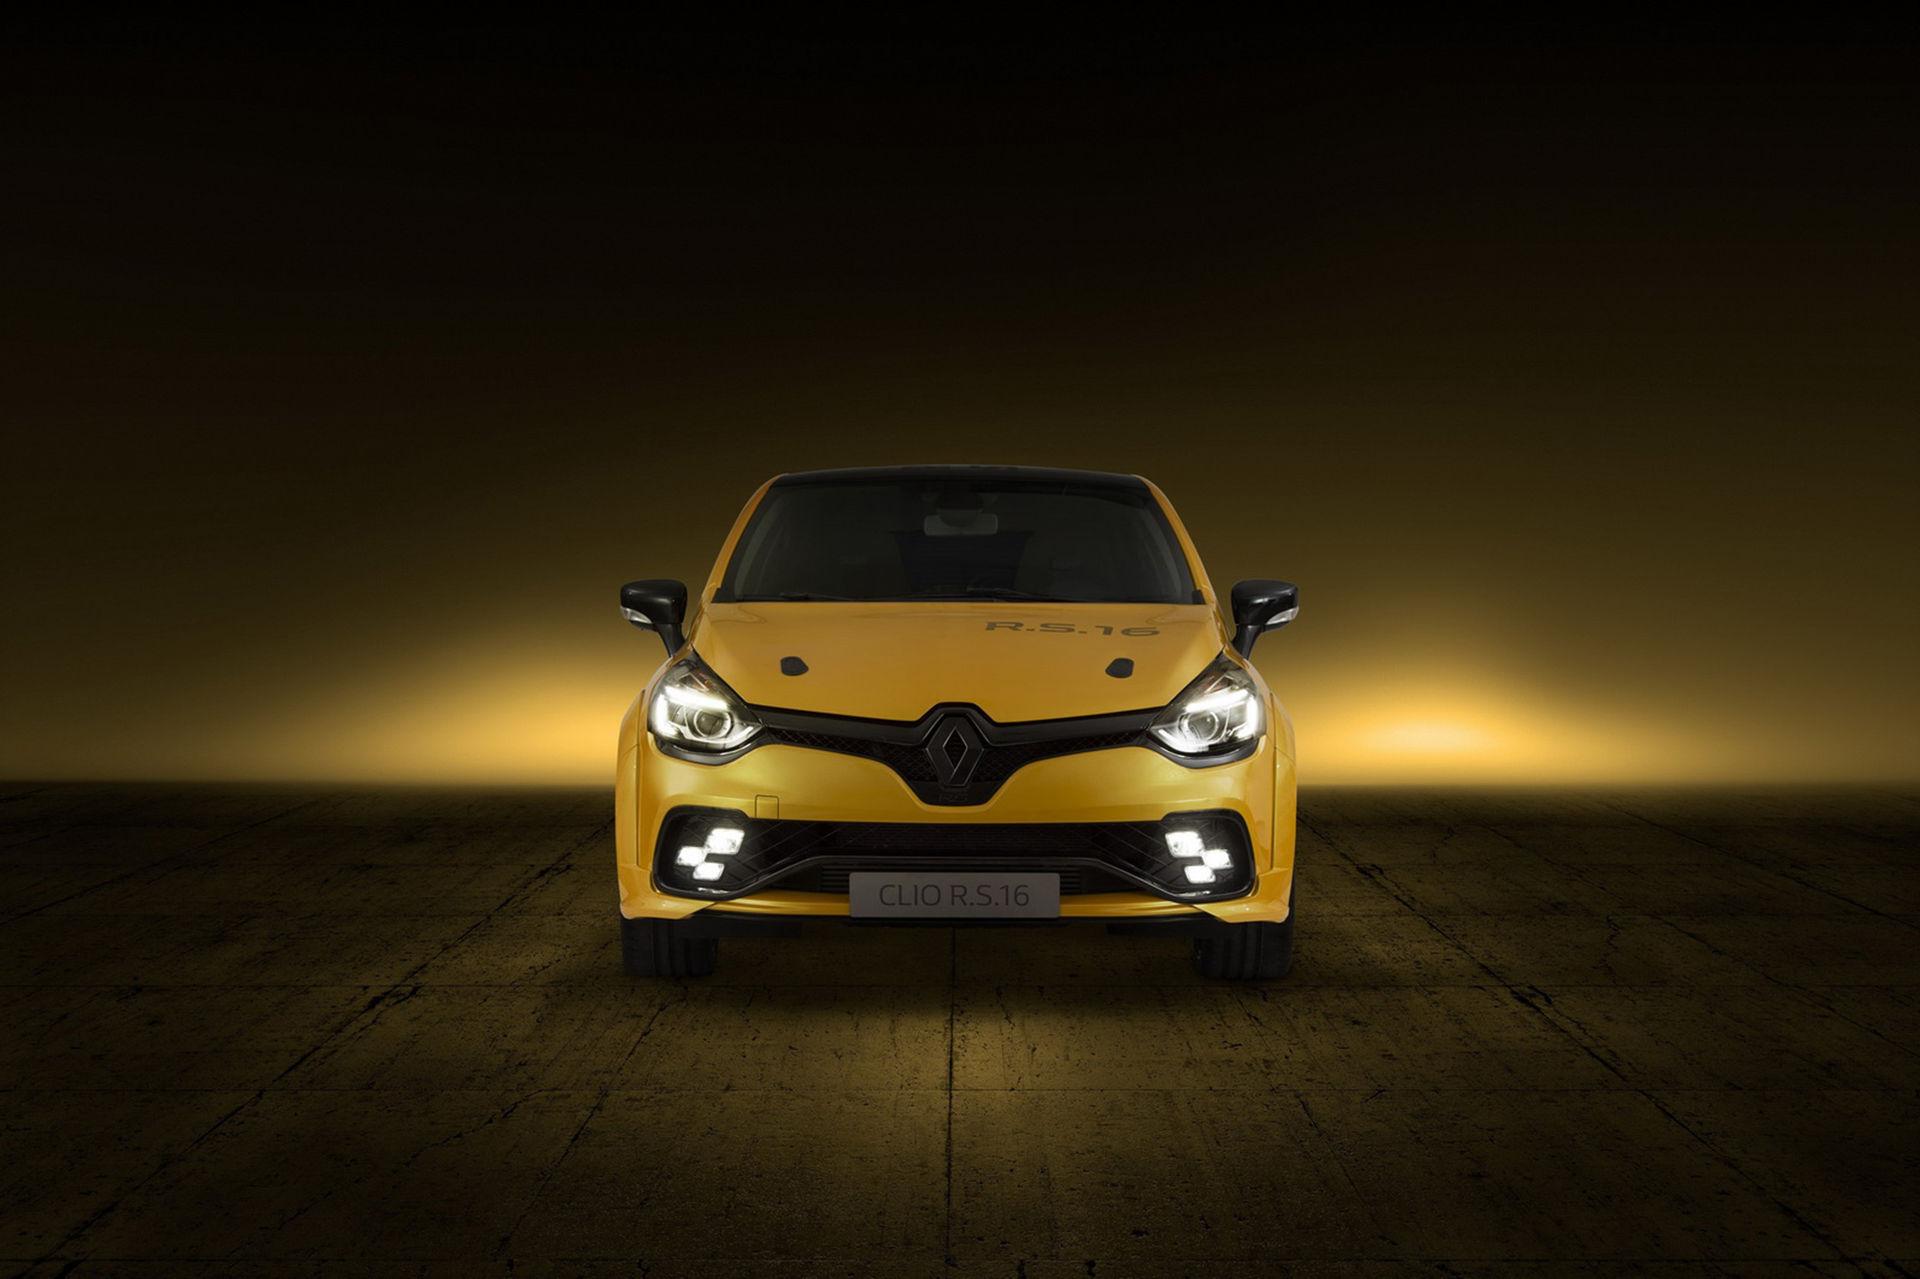 Renault presenterar Clio R.S.16